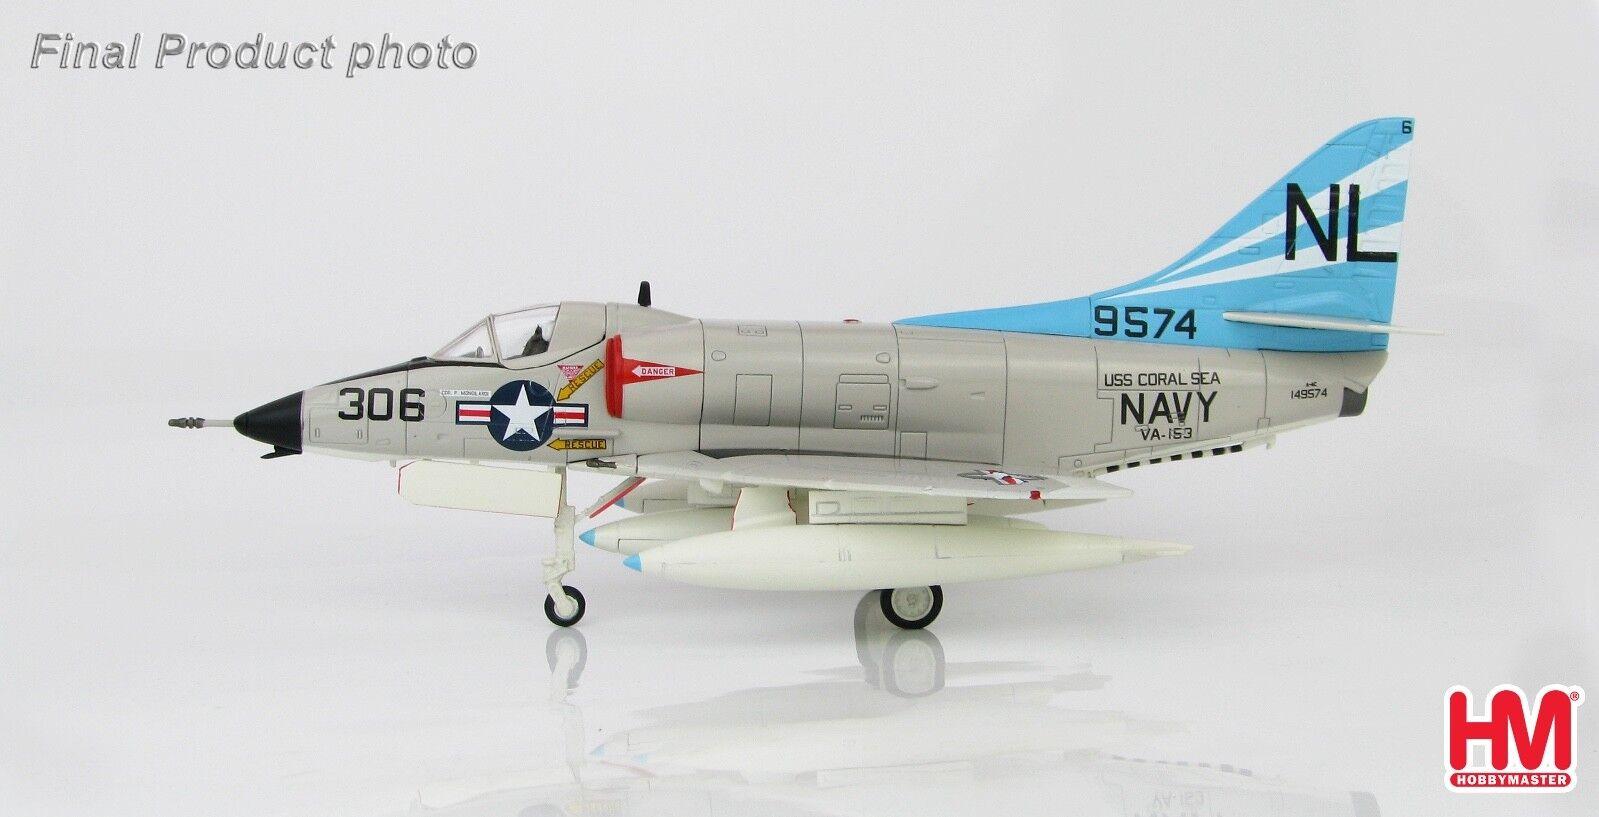 Hobby Master HA1428 1/72 Douglas A-4C Skyhawk 149574 VA-153 USS Coral Sea, 1960s